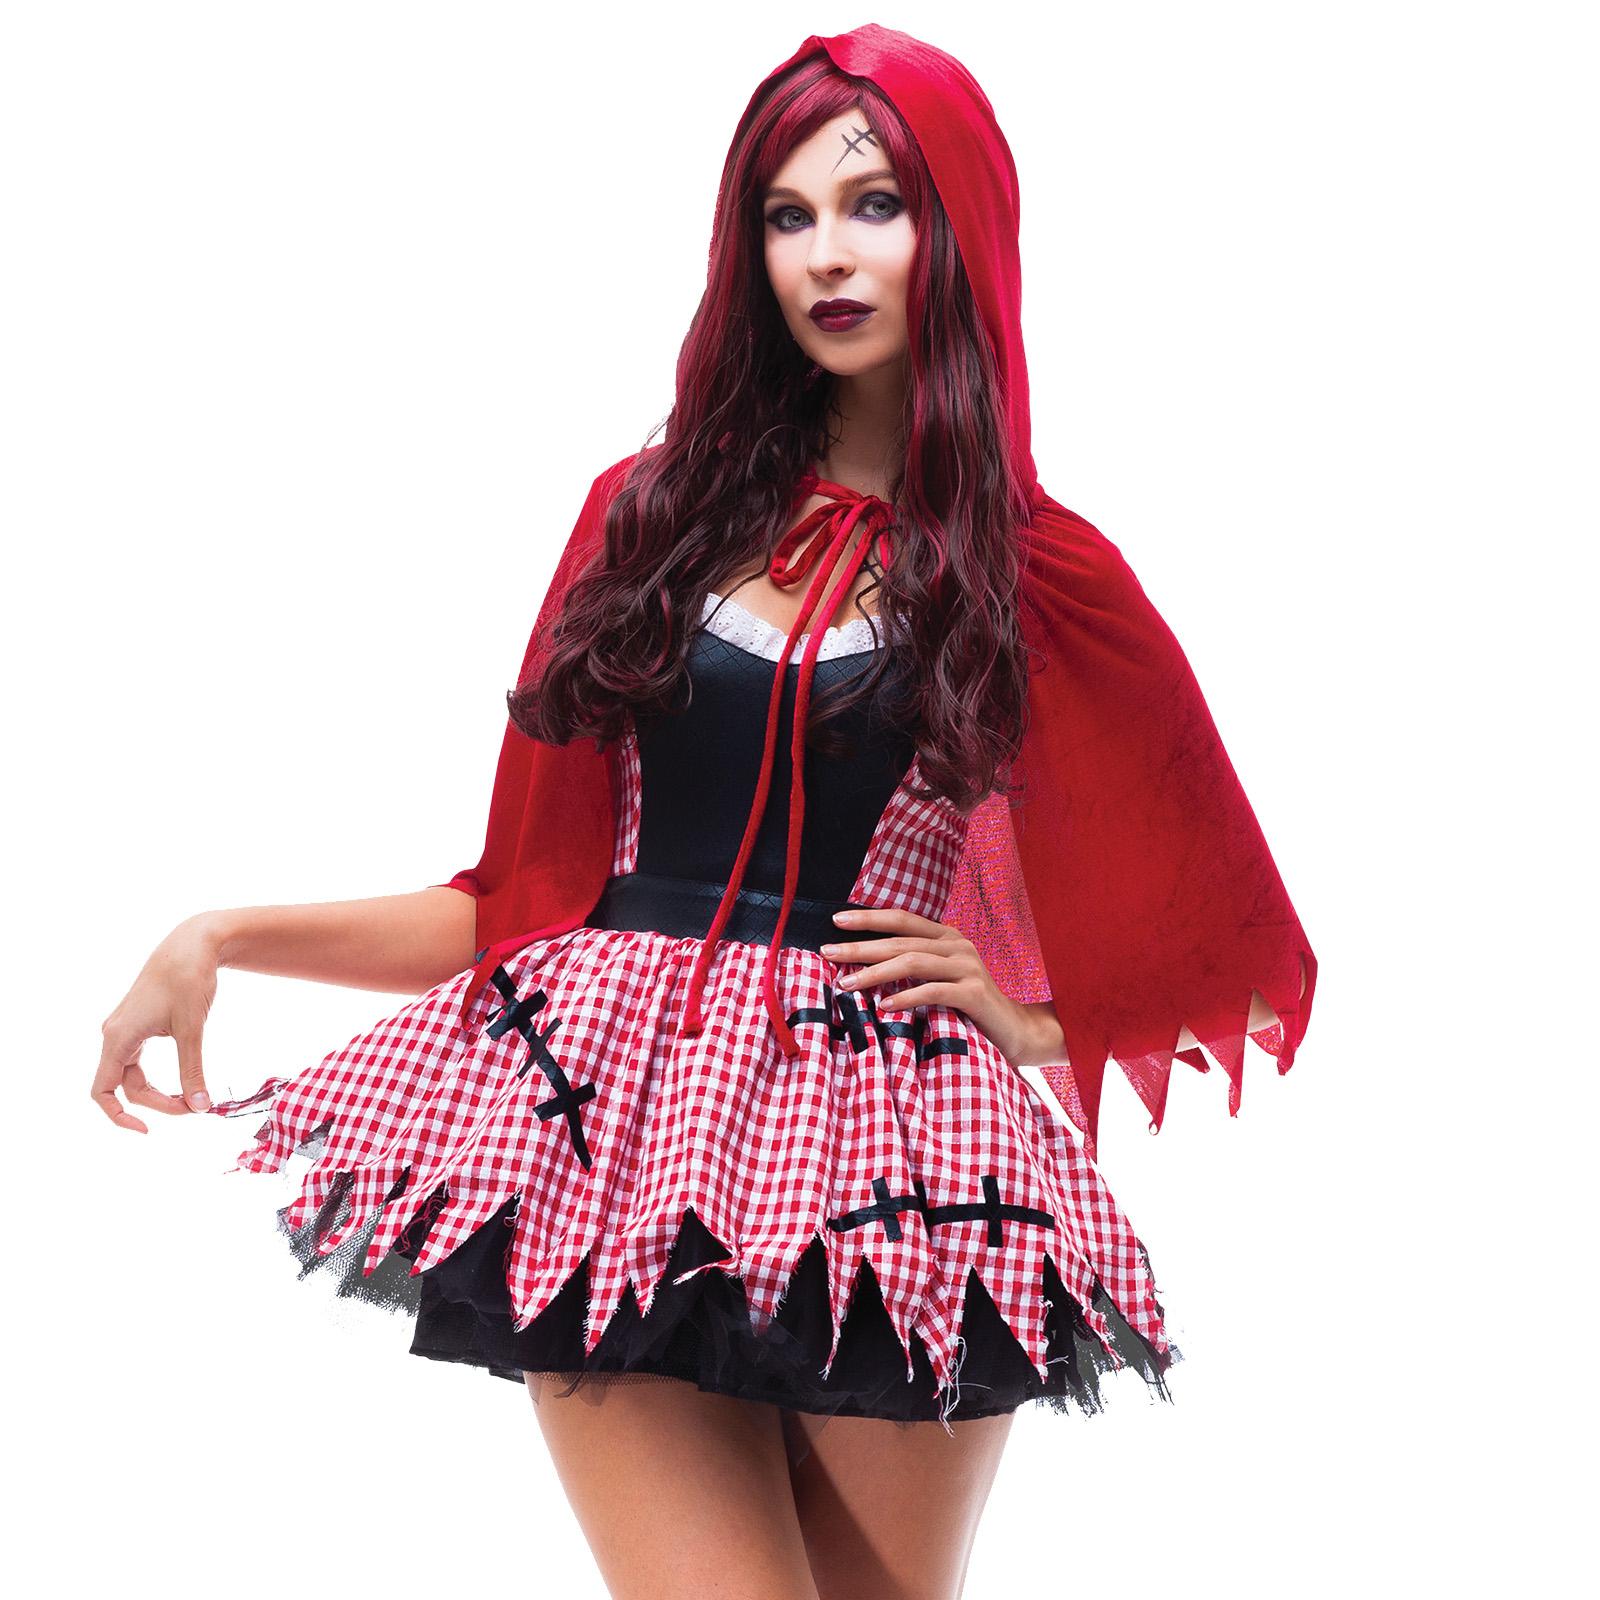 fasching horror zombie kost m damen halloween kleid karneval mottoparty ebay. Black Bedroom Furniture Sets. Home Design Ideas